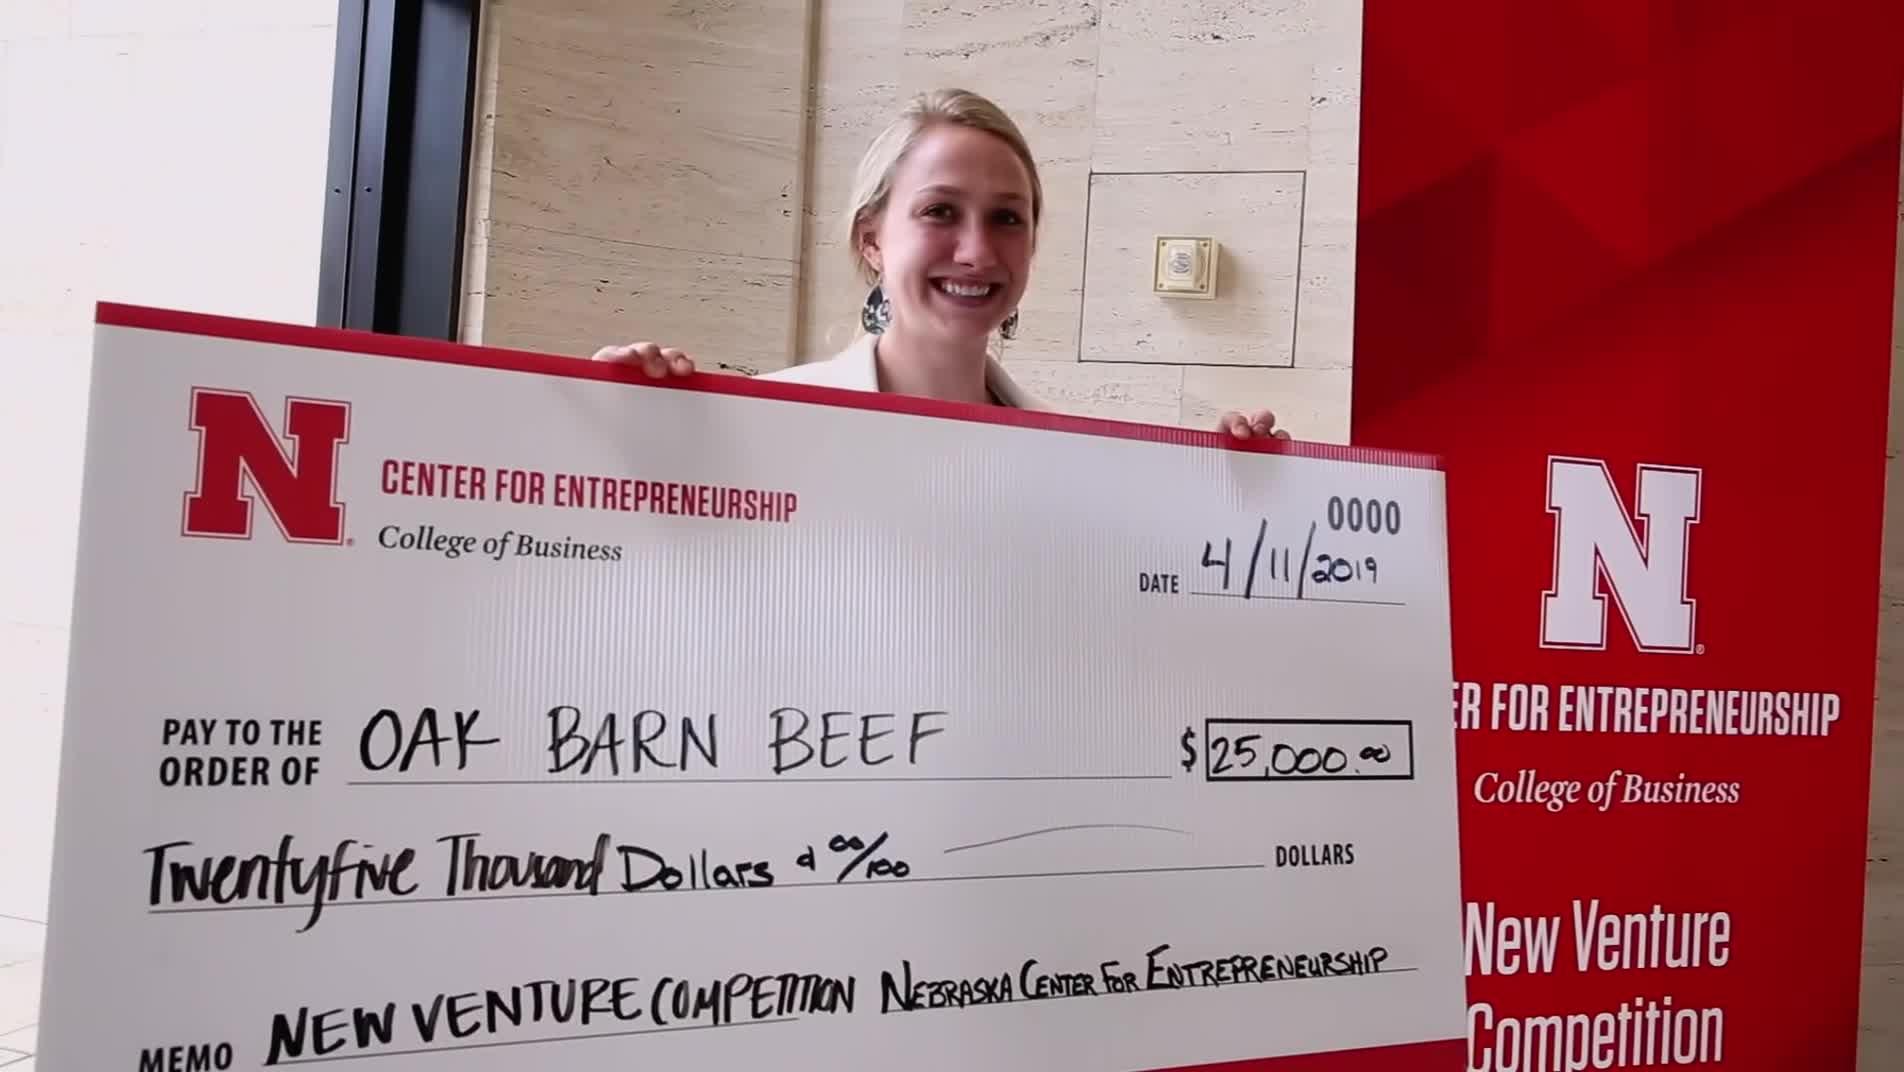 New Venture Competition: Hannah Esch